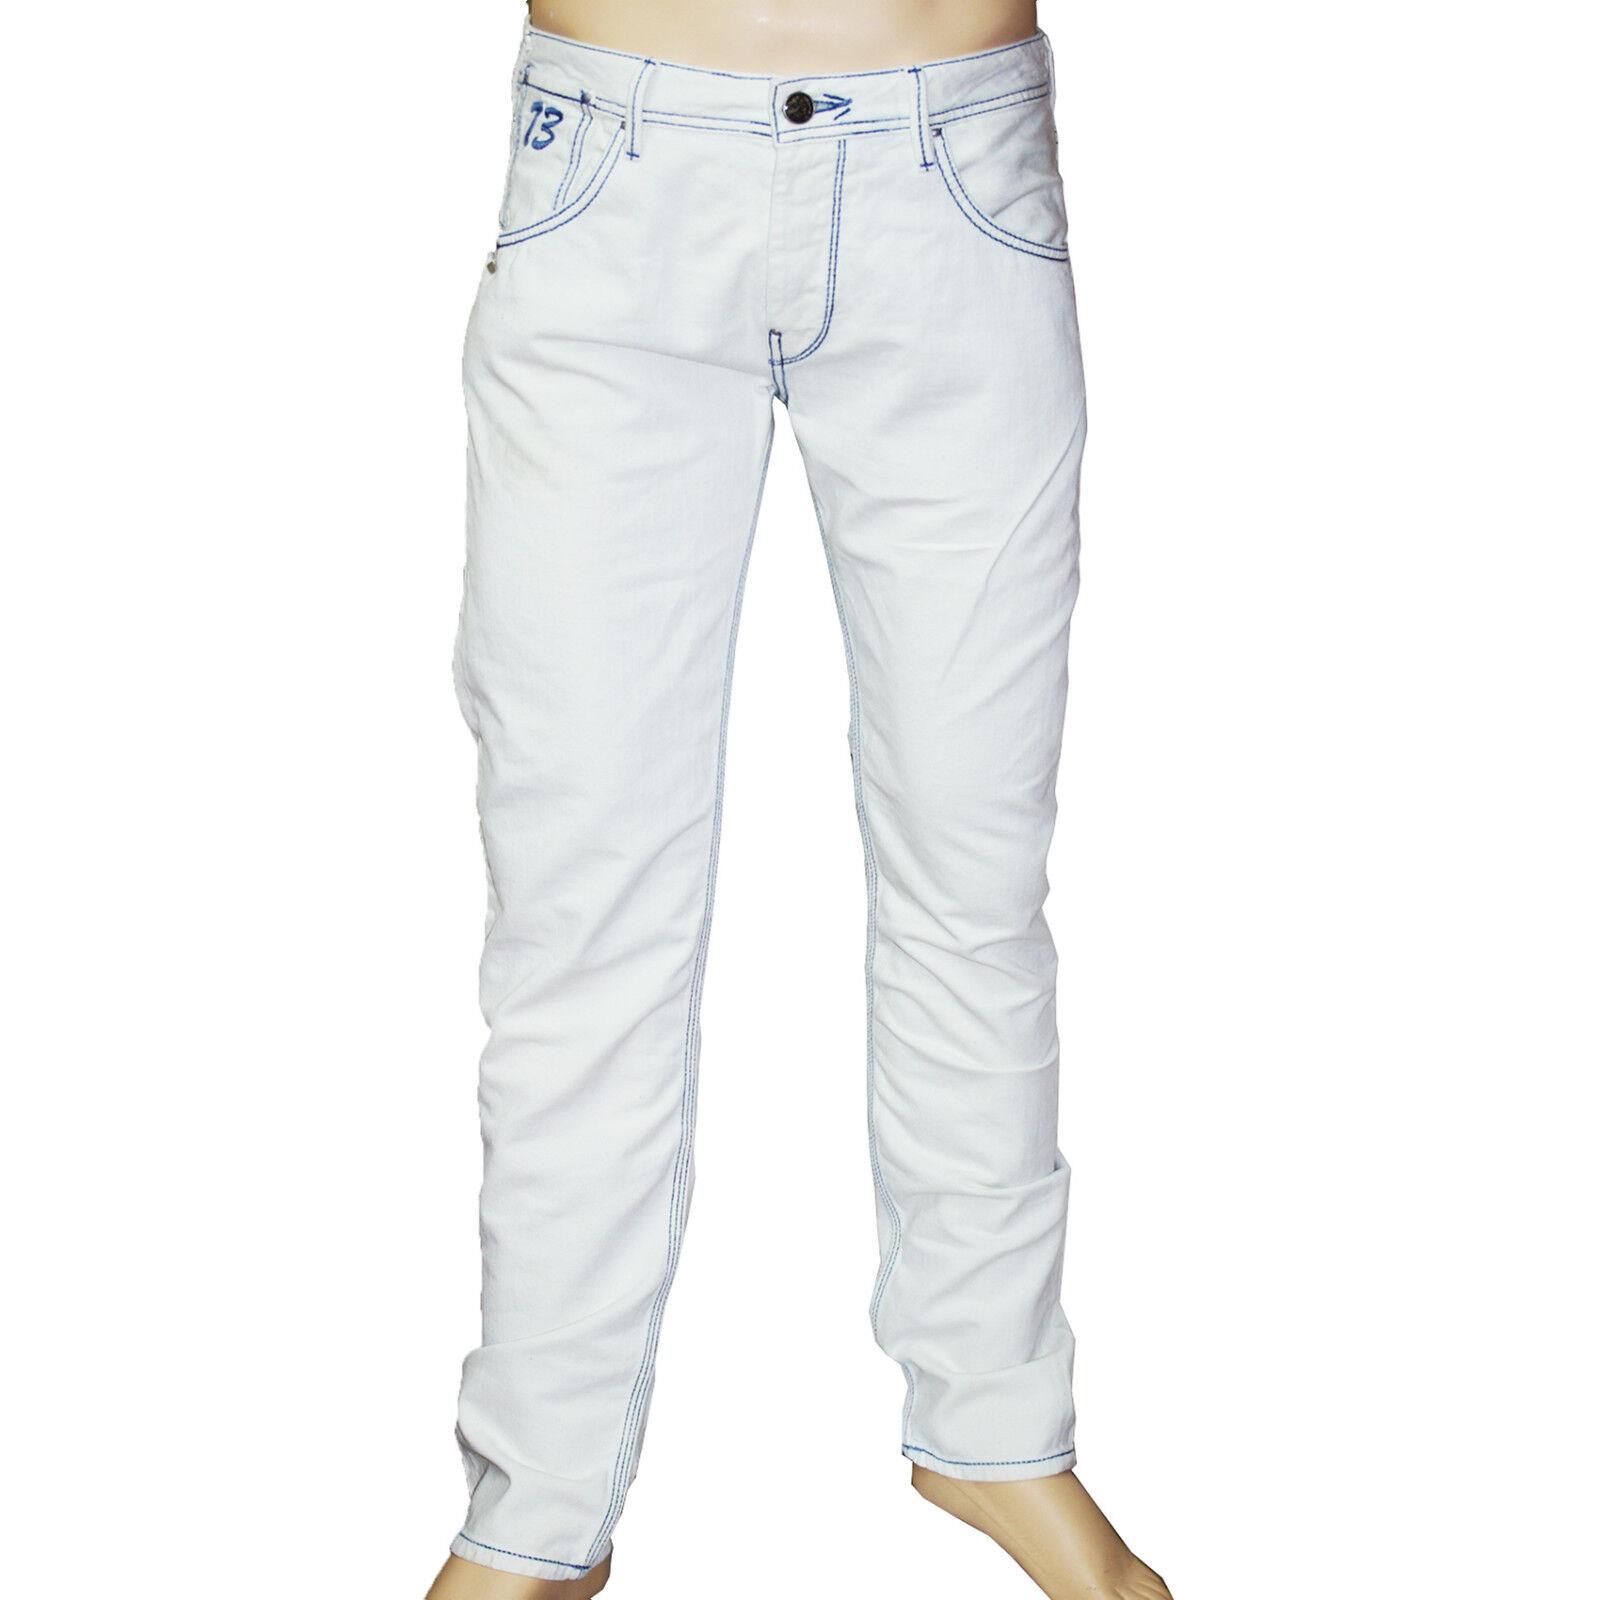 PEPE PEPE PEPE JEANS Jeans homme DYNAMITE INDIGO bianca cassé Dimensione 31 US b2b9e9